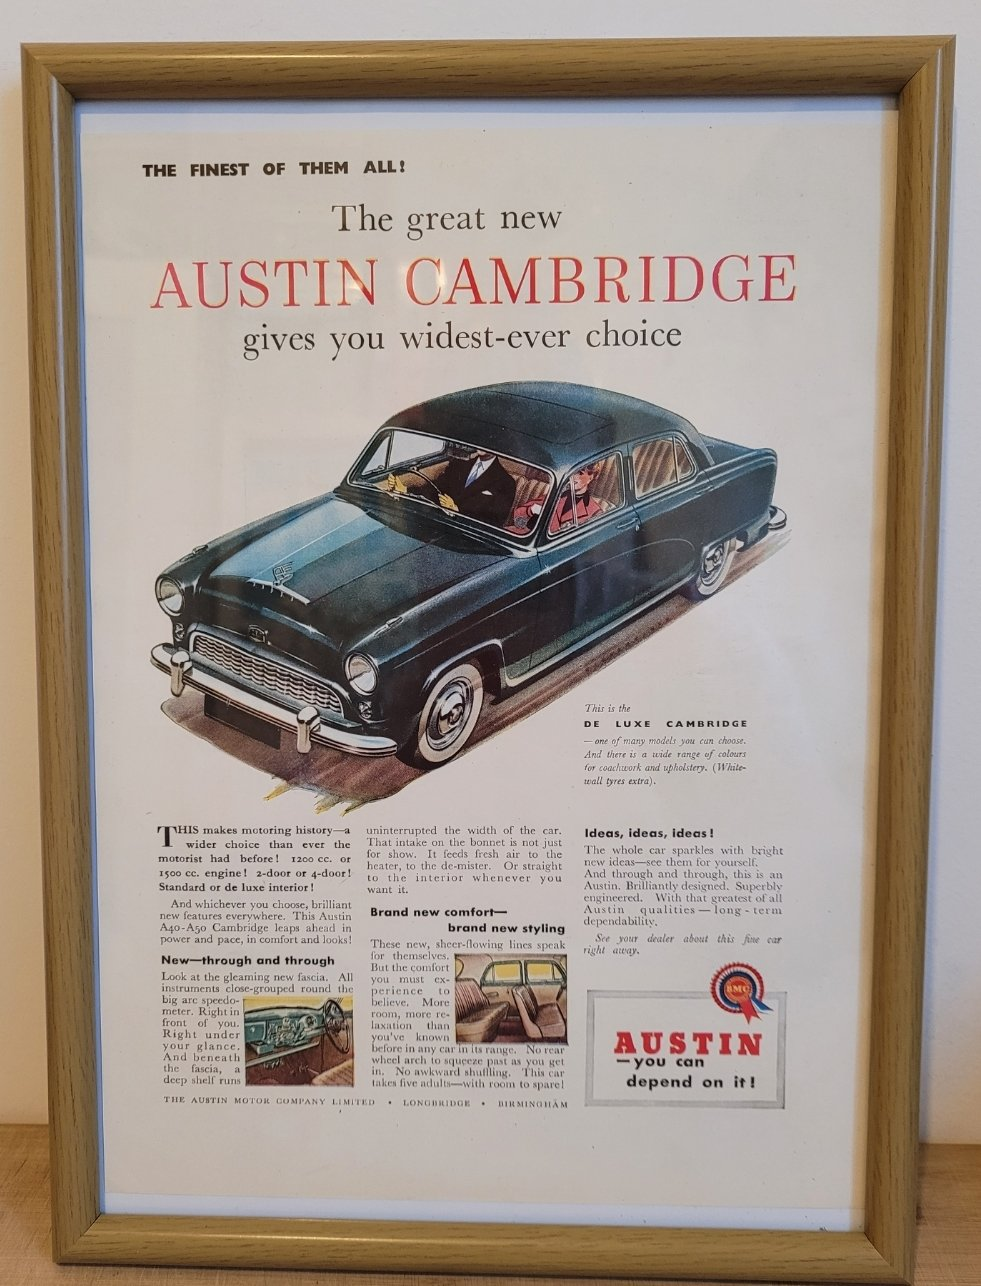 Picture of 1996 Original 1954 Austin Cambridge Framed Advert